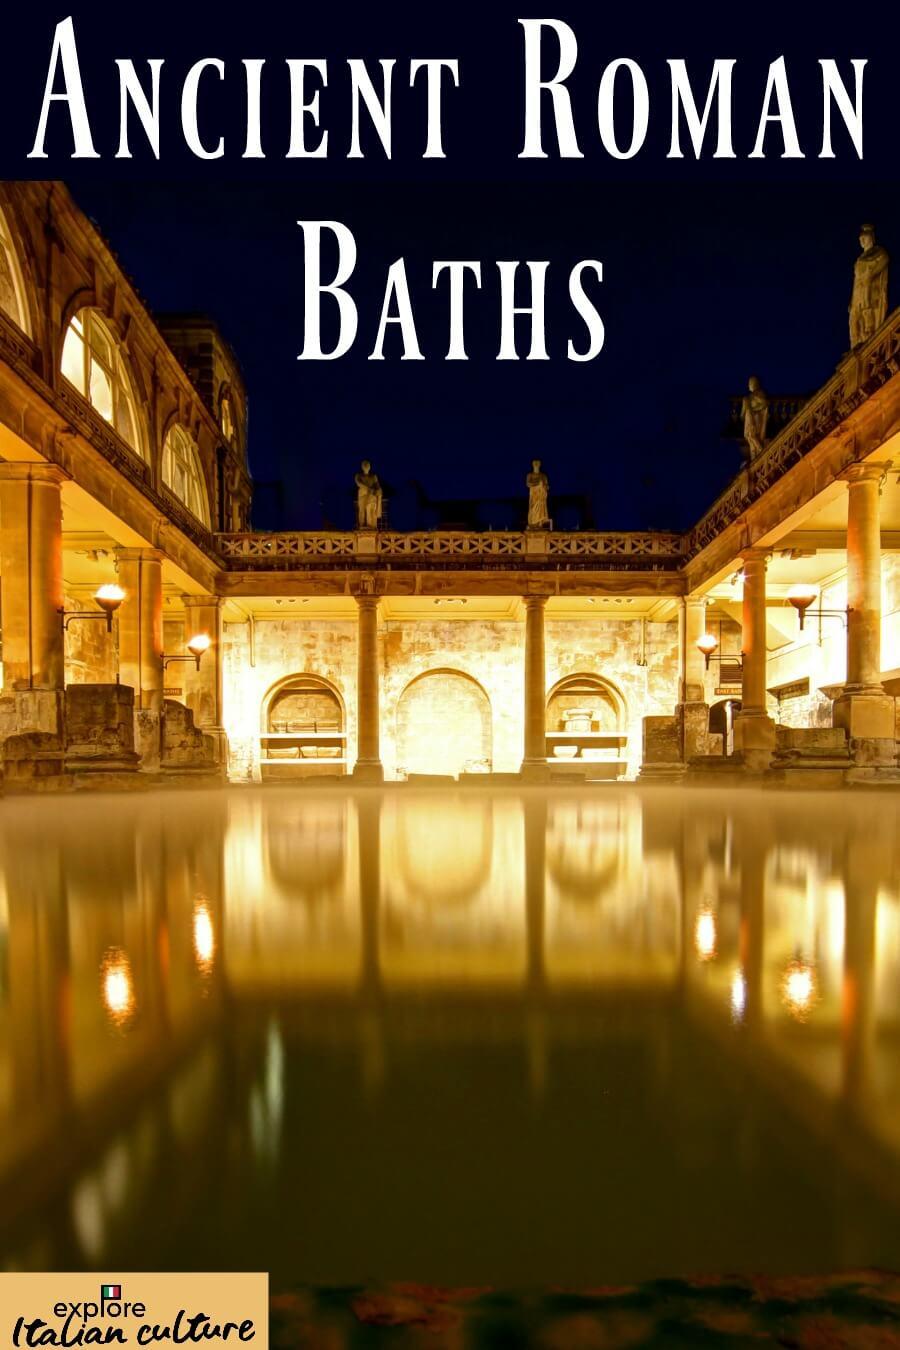 Ancient Roman bathhouses clickable link